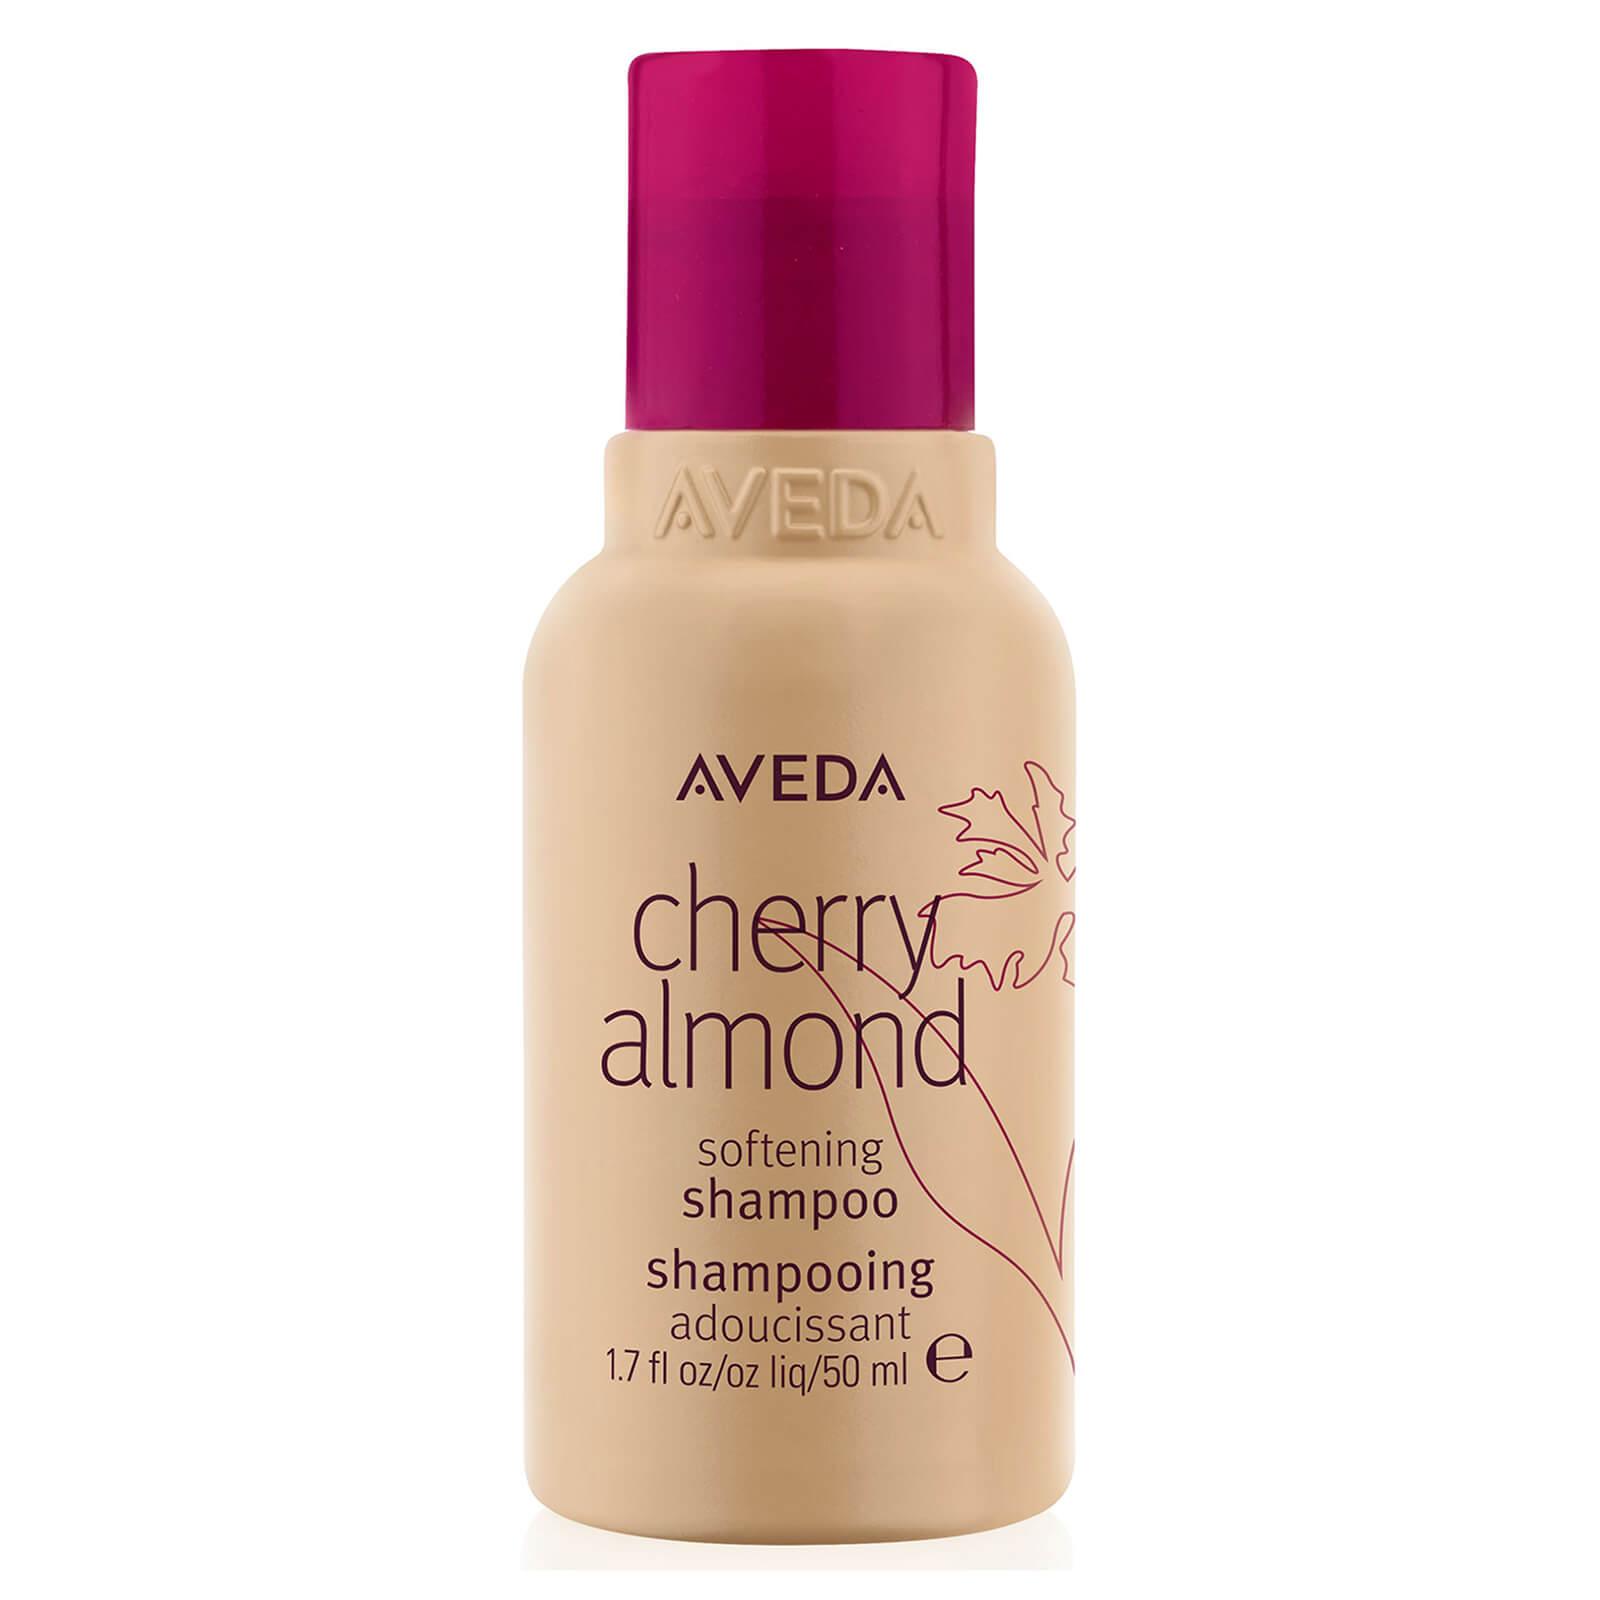 Aveda Cherry Almond Shampoo Travel Size 50ml